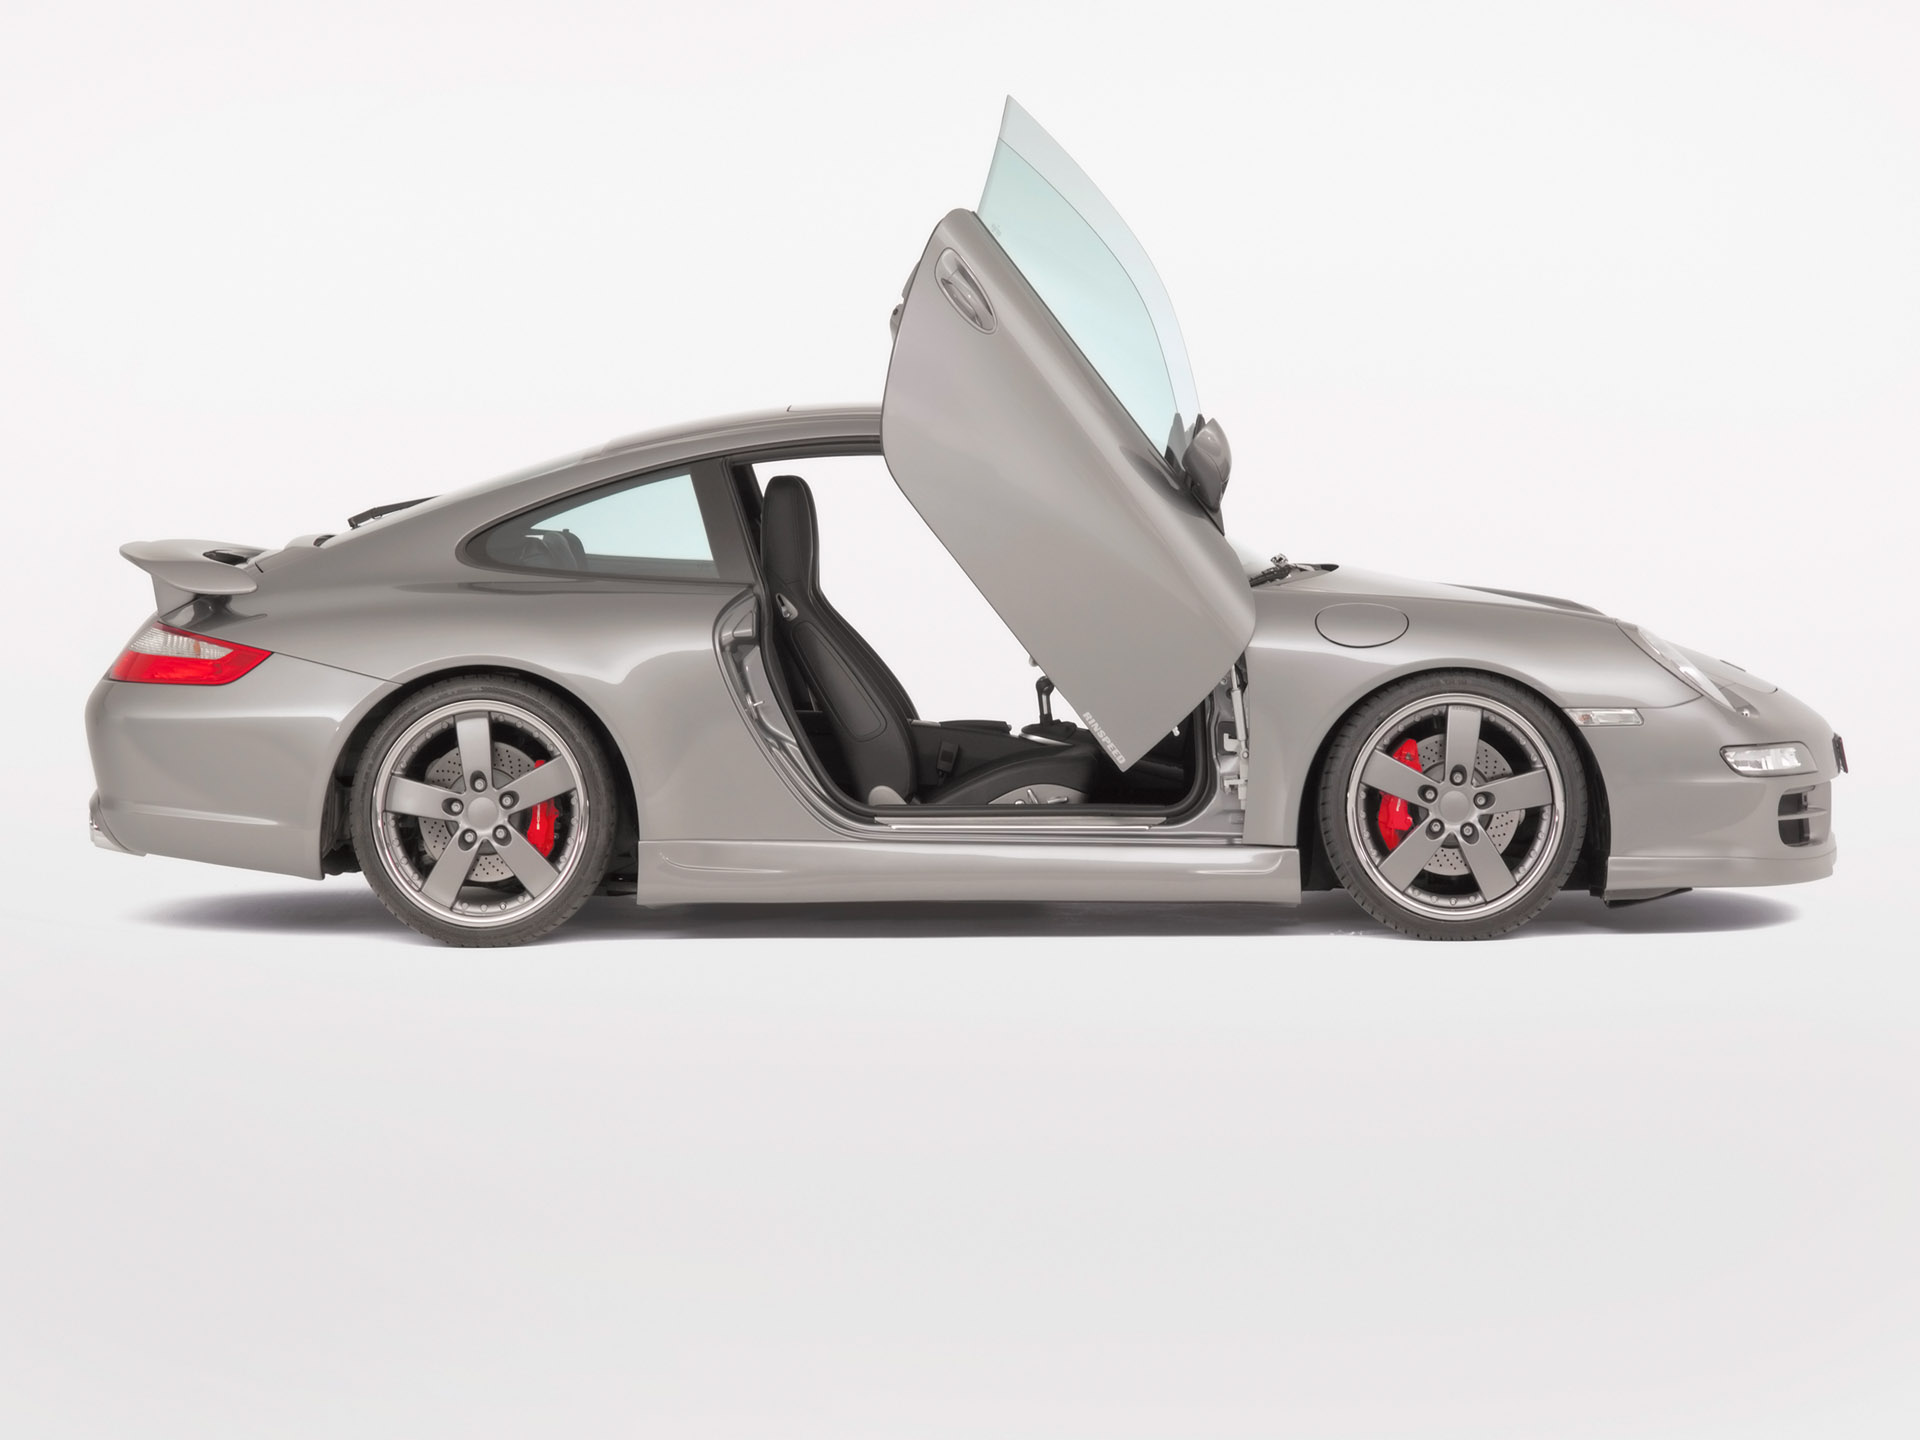 2005 Porsche 911 Image